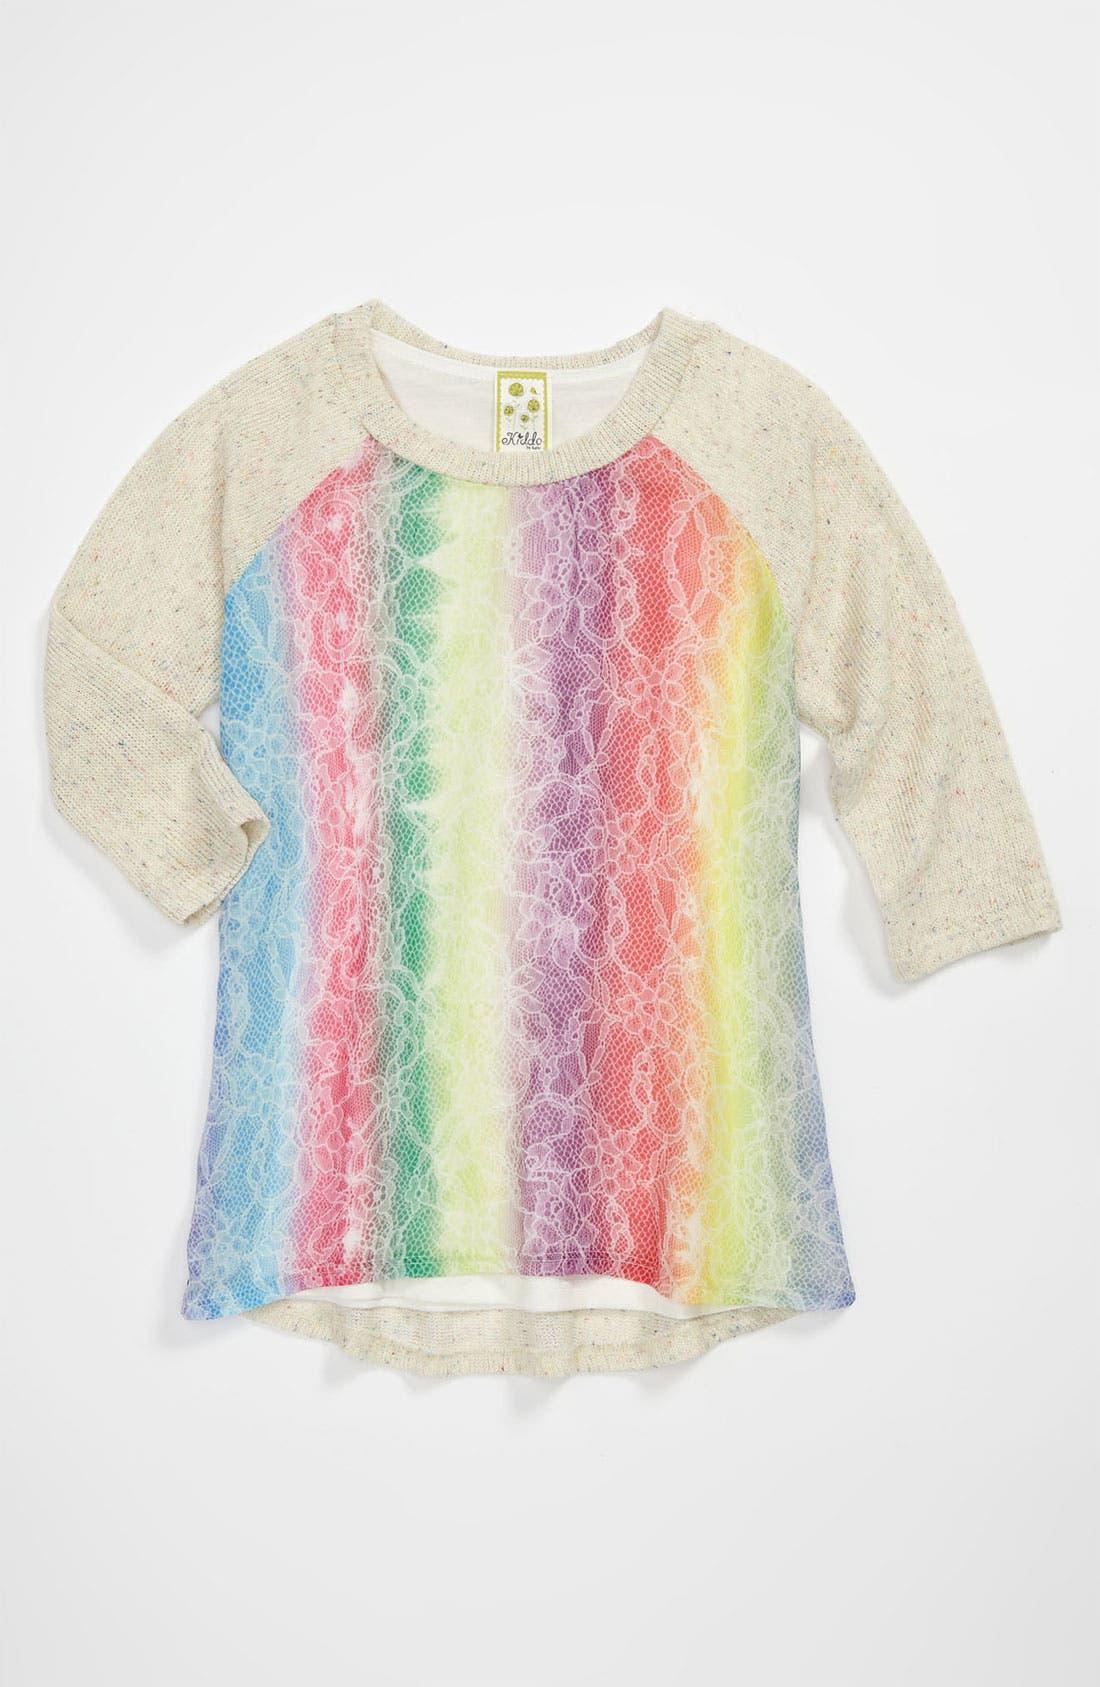 Alternate Image 1 Selected - Kiddo 'Rainbow Lace' Sweater (Big Girls)